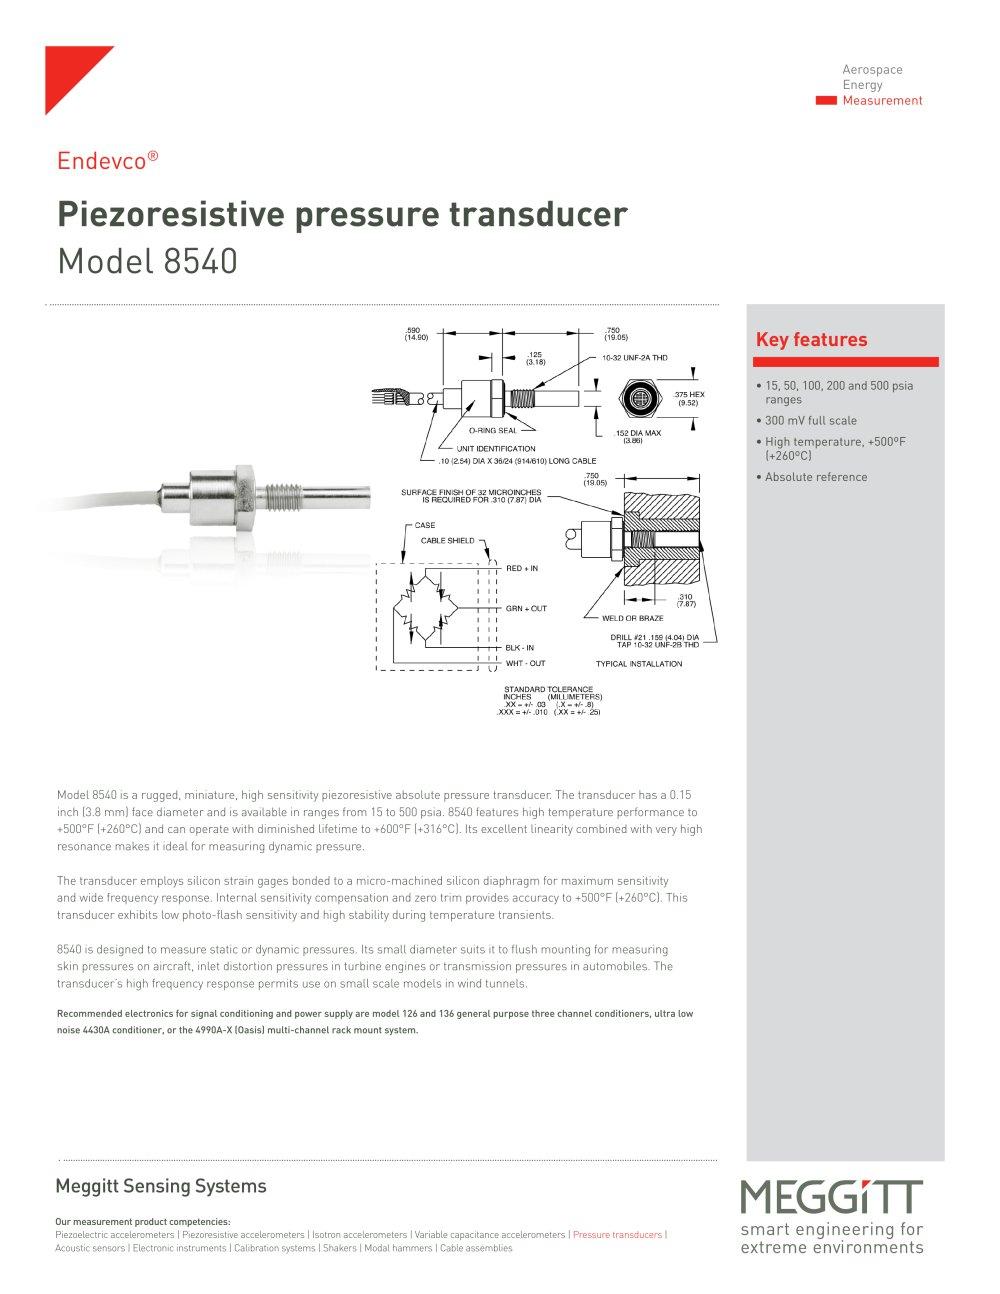 Piezoresistive transducer